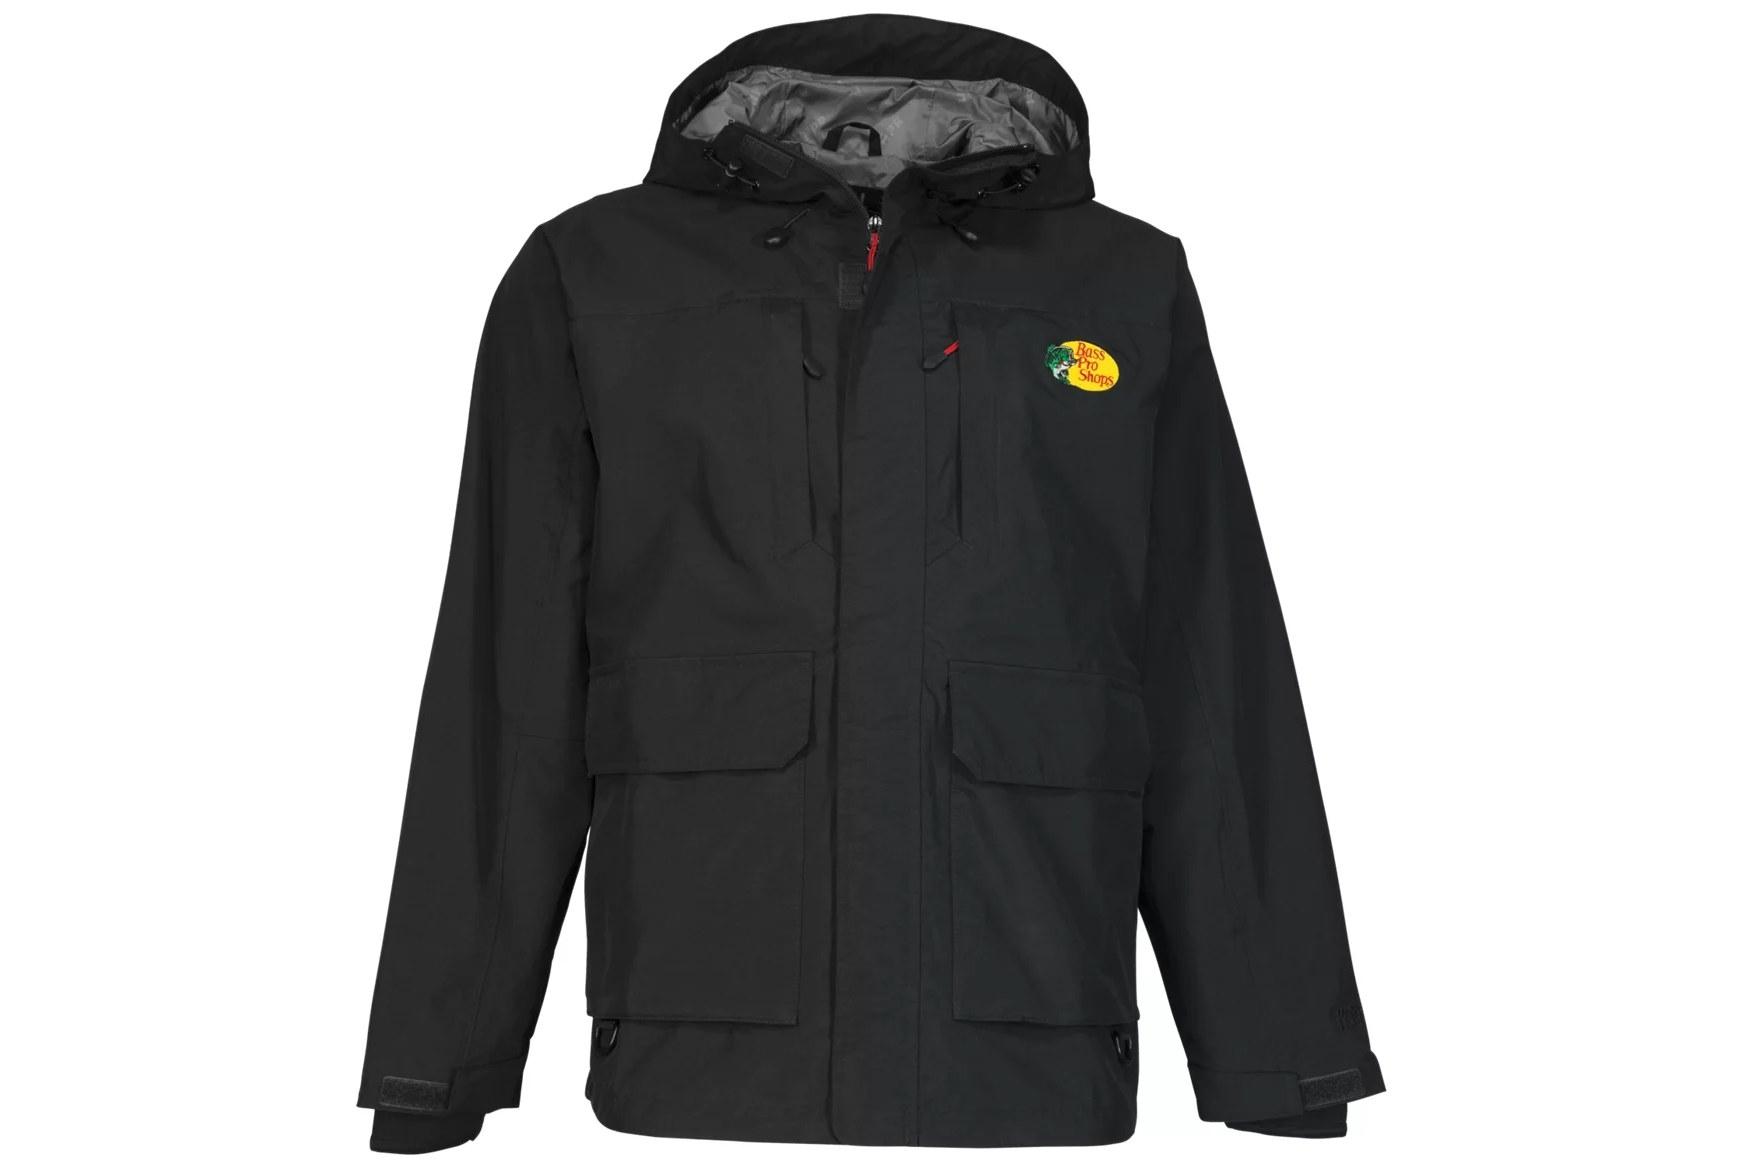 The black rain jacket